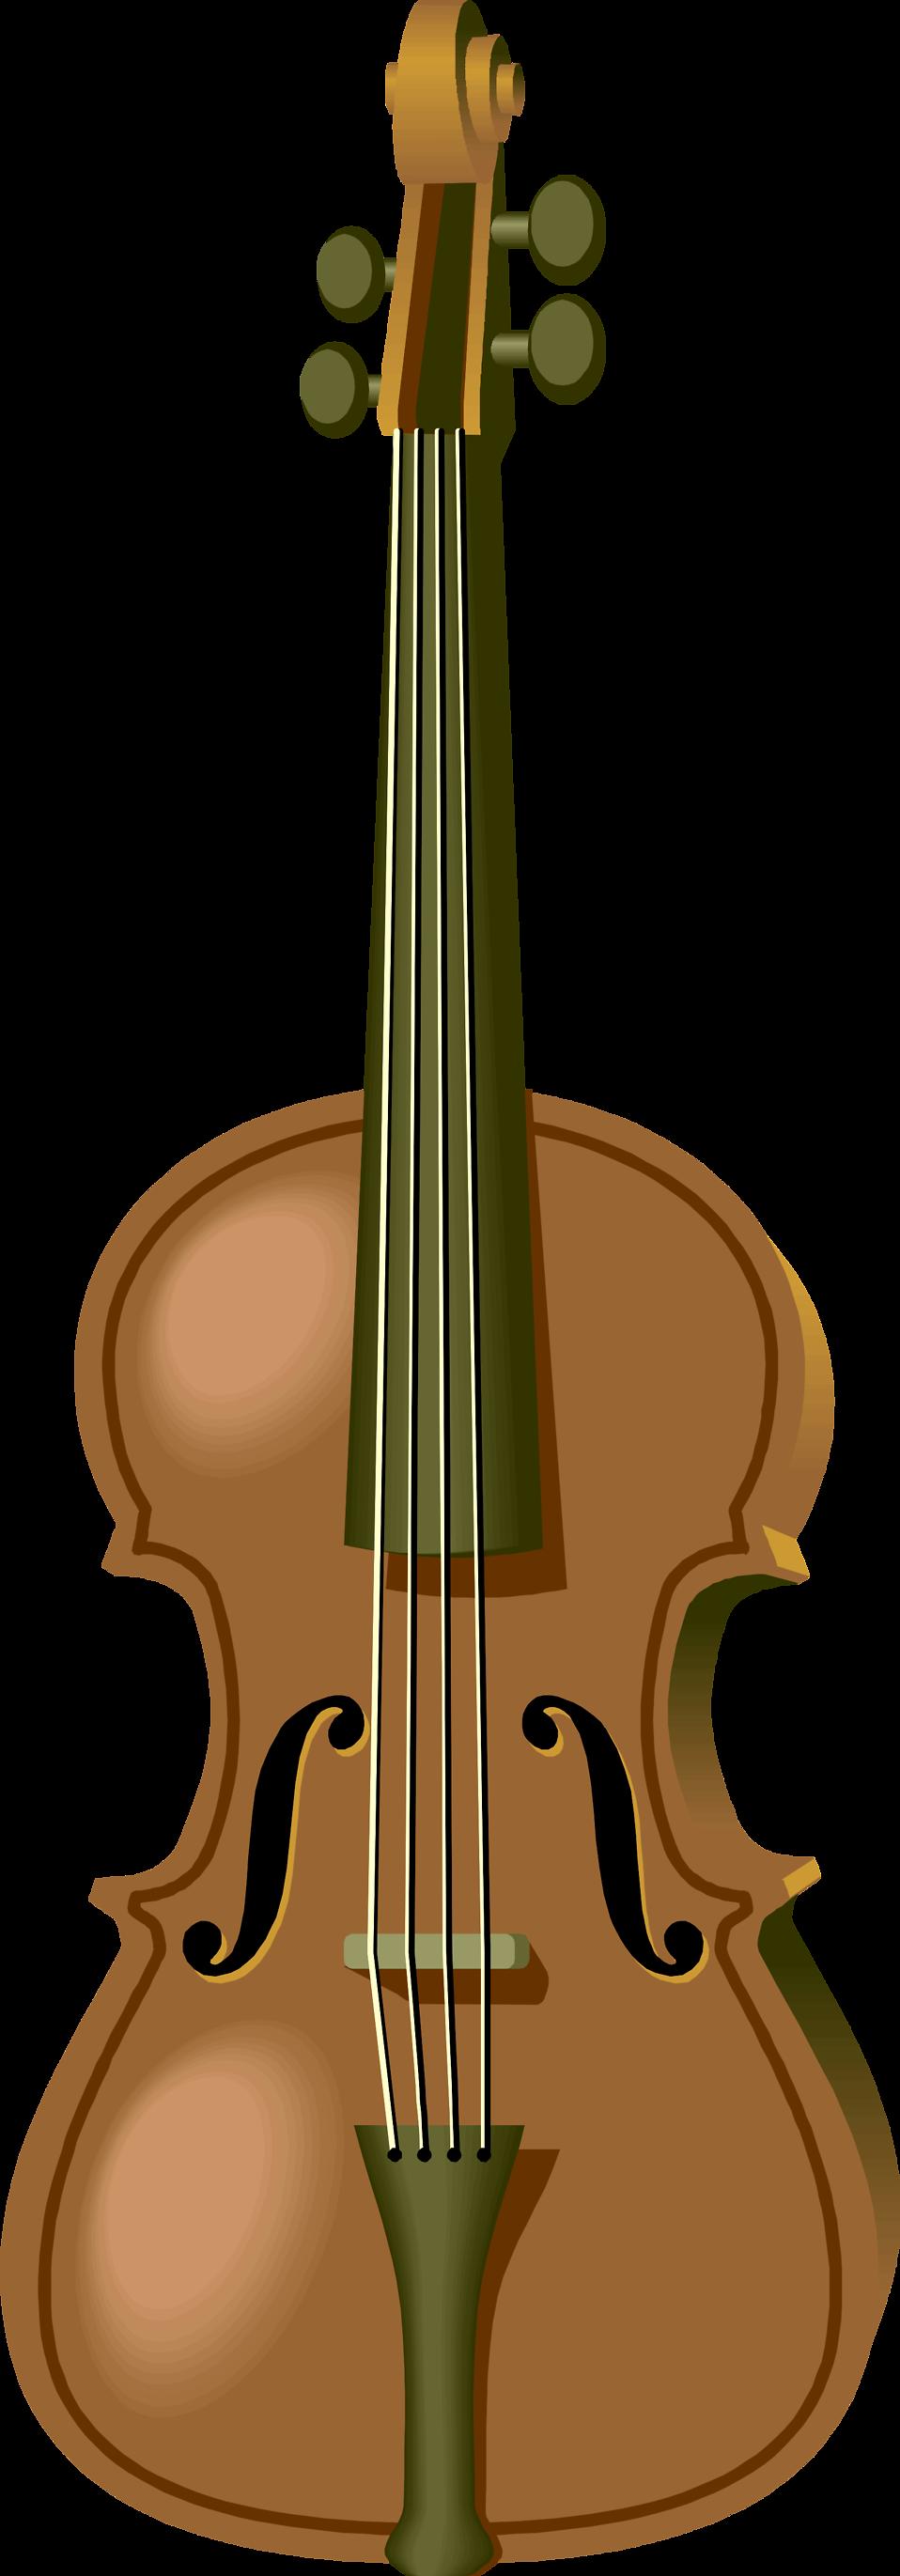 Illustration of a violin : Free Stock Photo